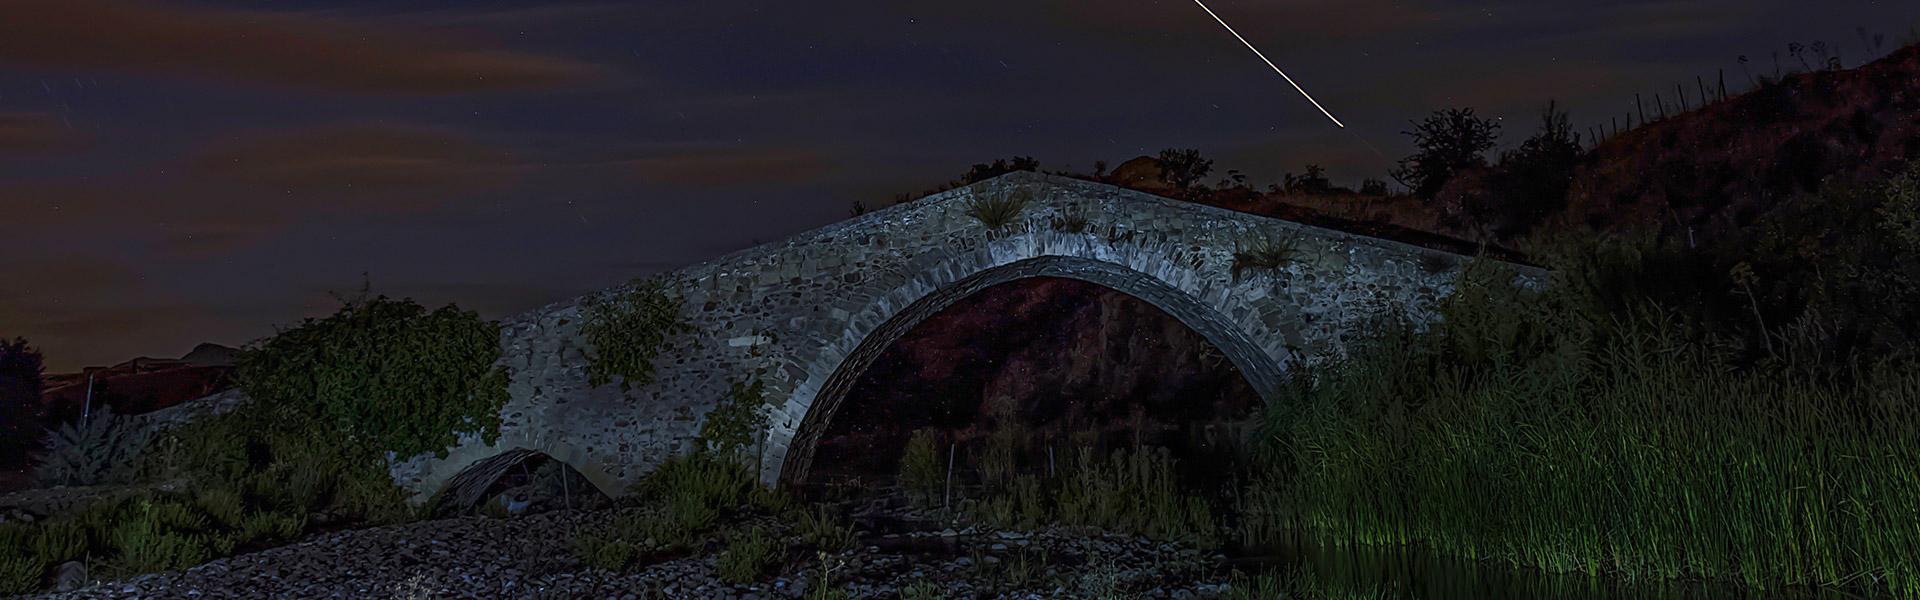 ponte-failla1